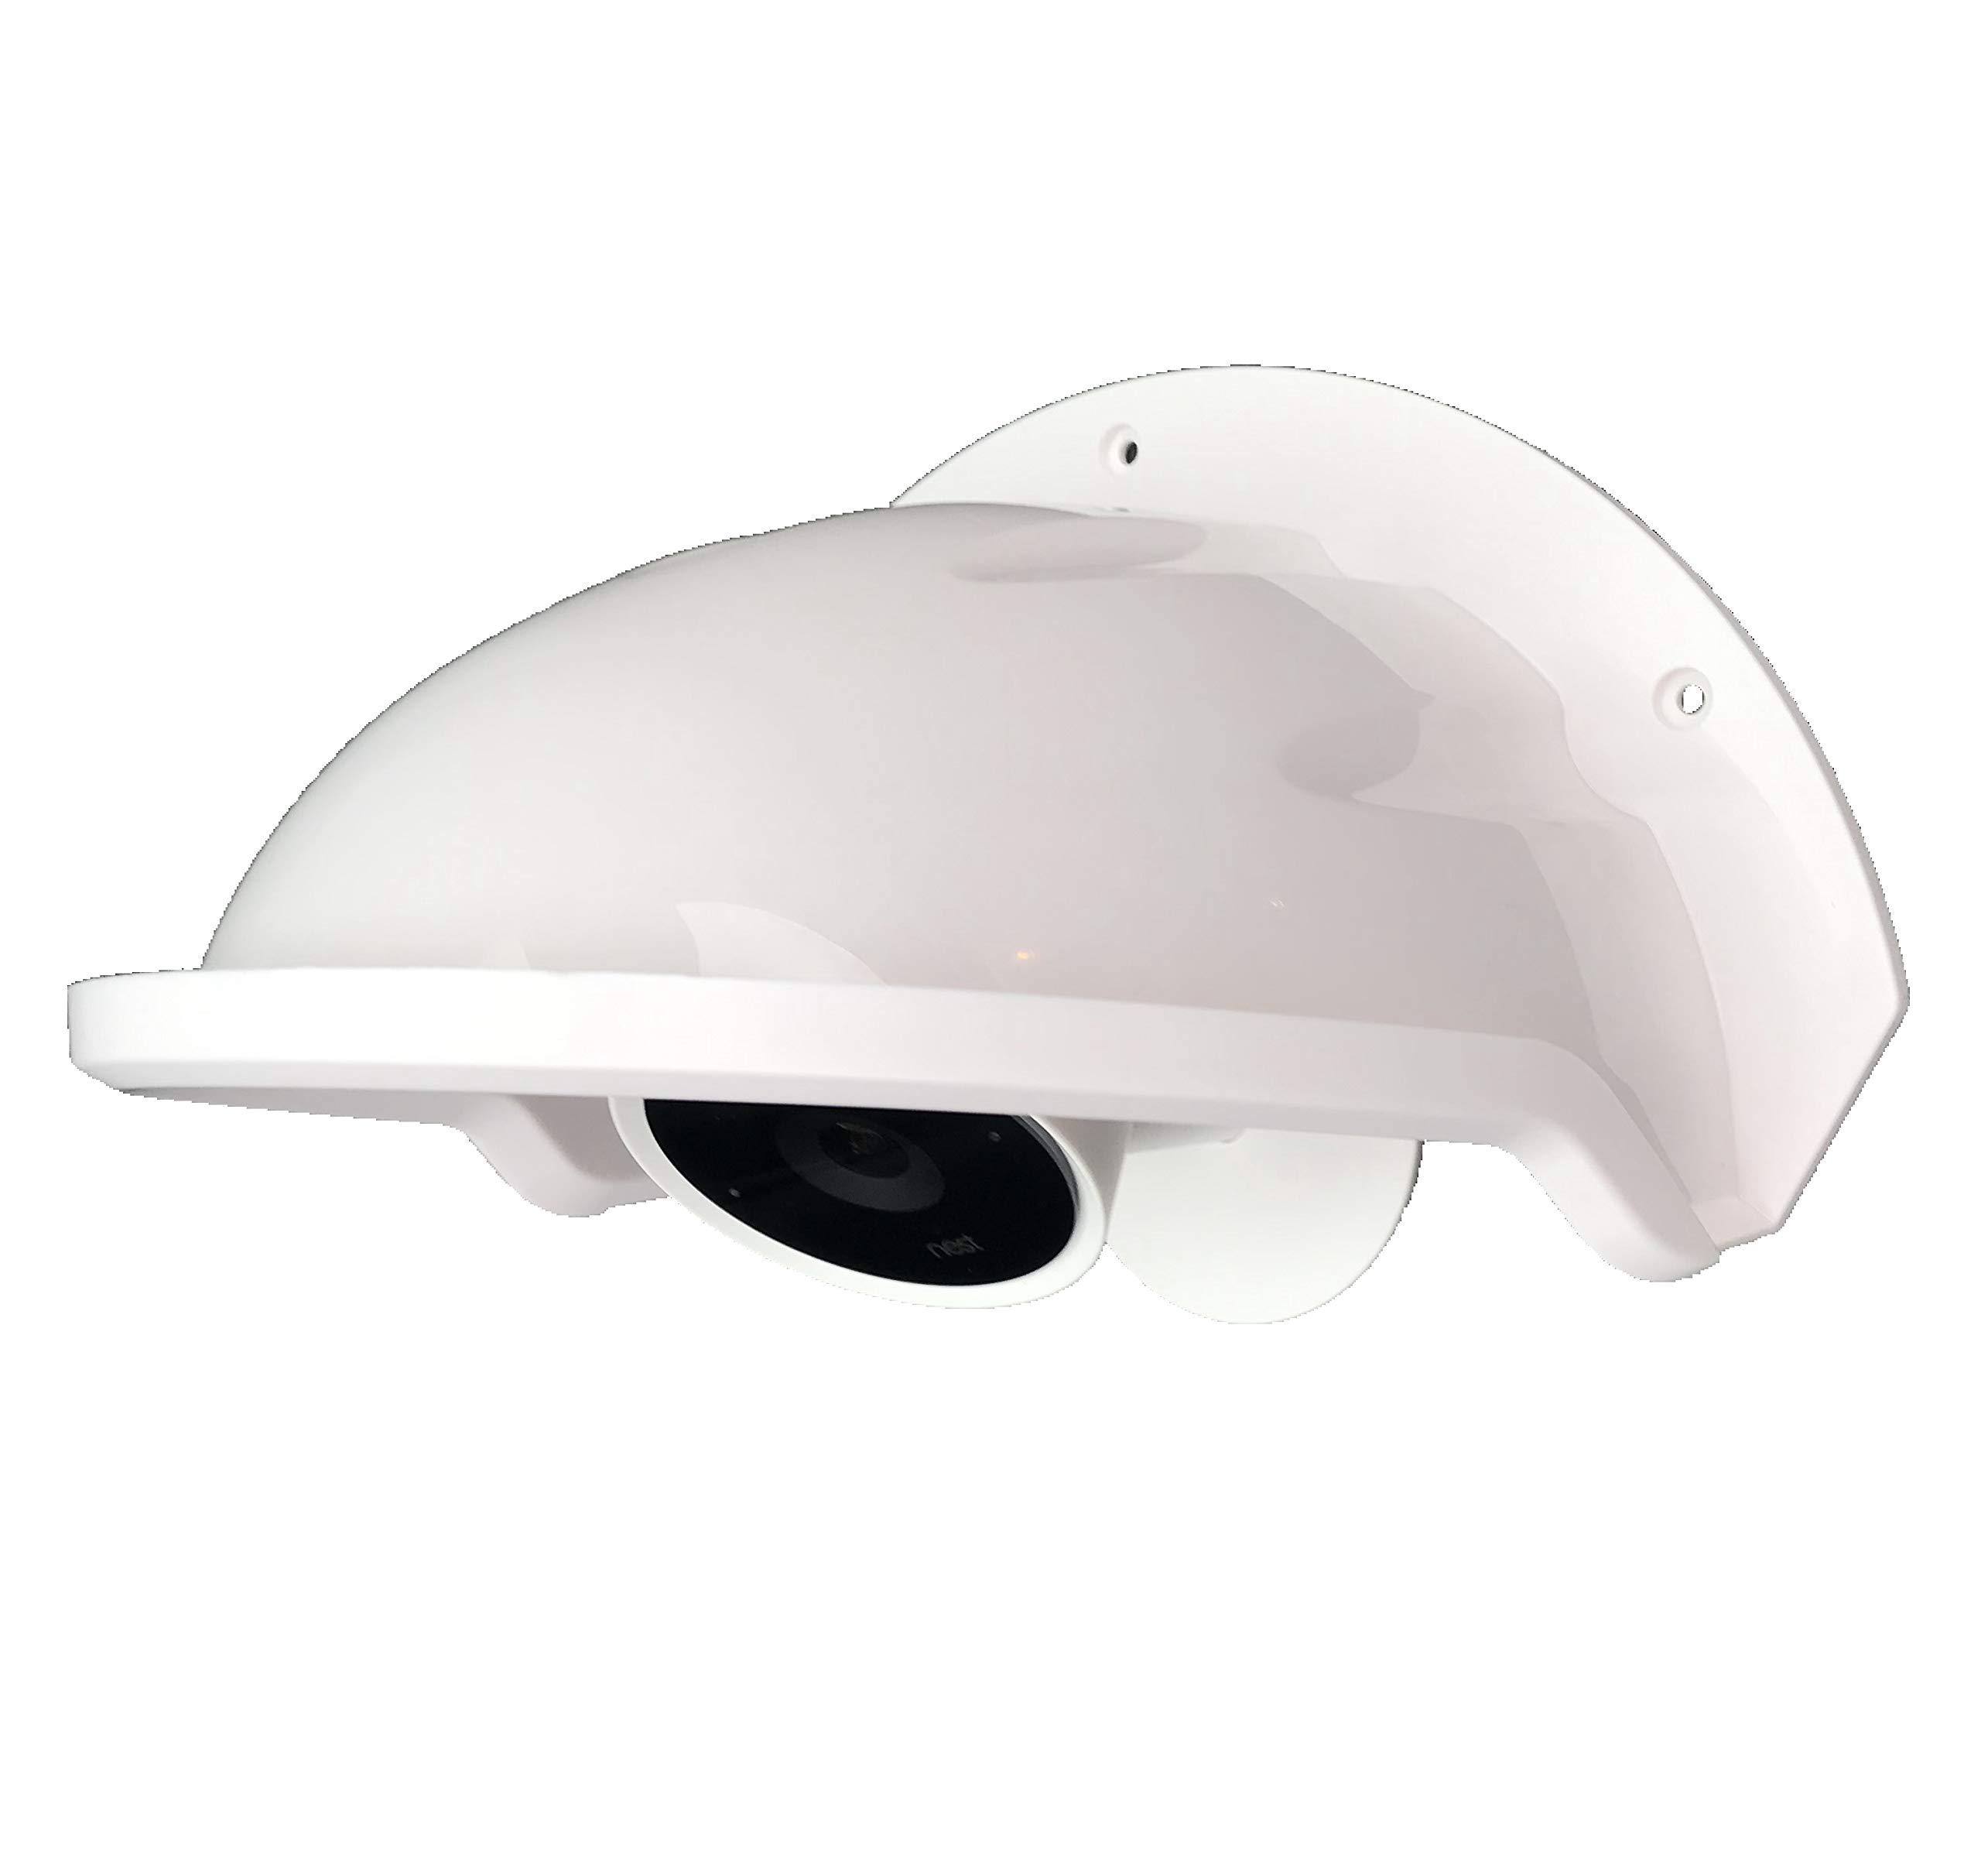 Universal Sun Rain Shade Camera Cover Shield for Nest/Ring/Arlo/Dome/Bullet Outdoor Camera - White by Ade Advanced Optics